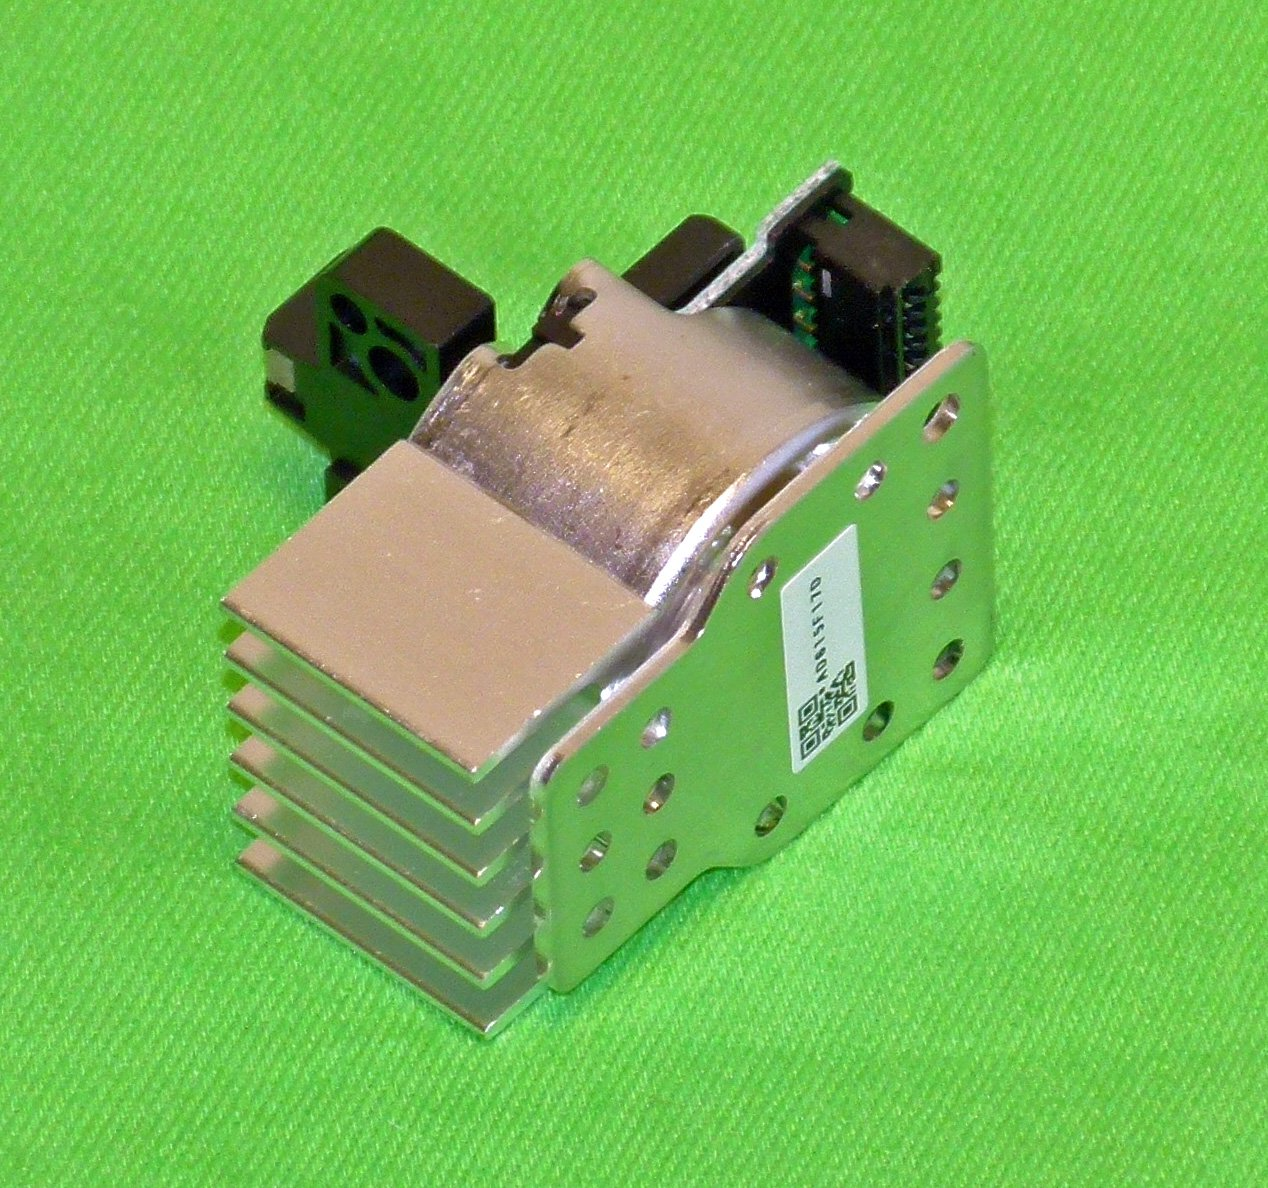 OEM Epson Print Head - Series TM-U220PD - Models: (002), (052), (103), (153) by Epson